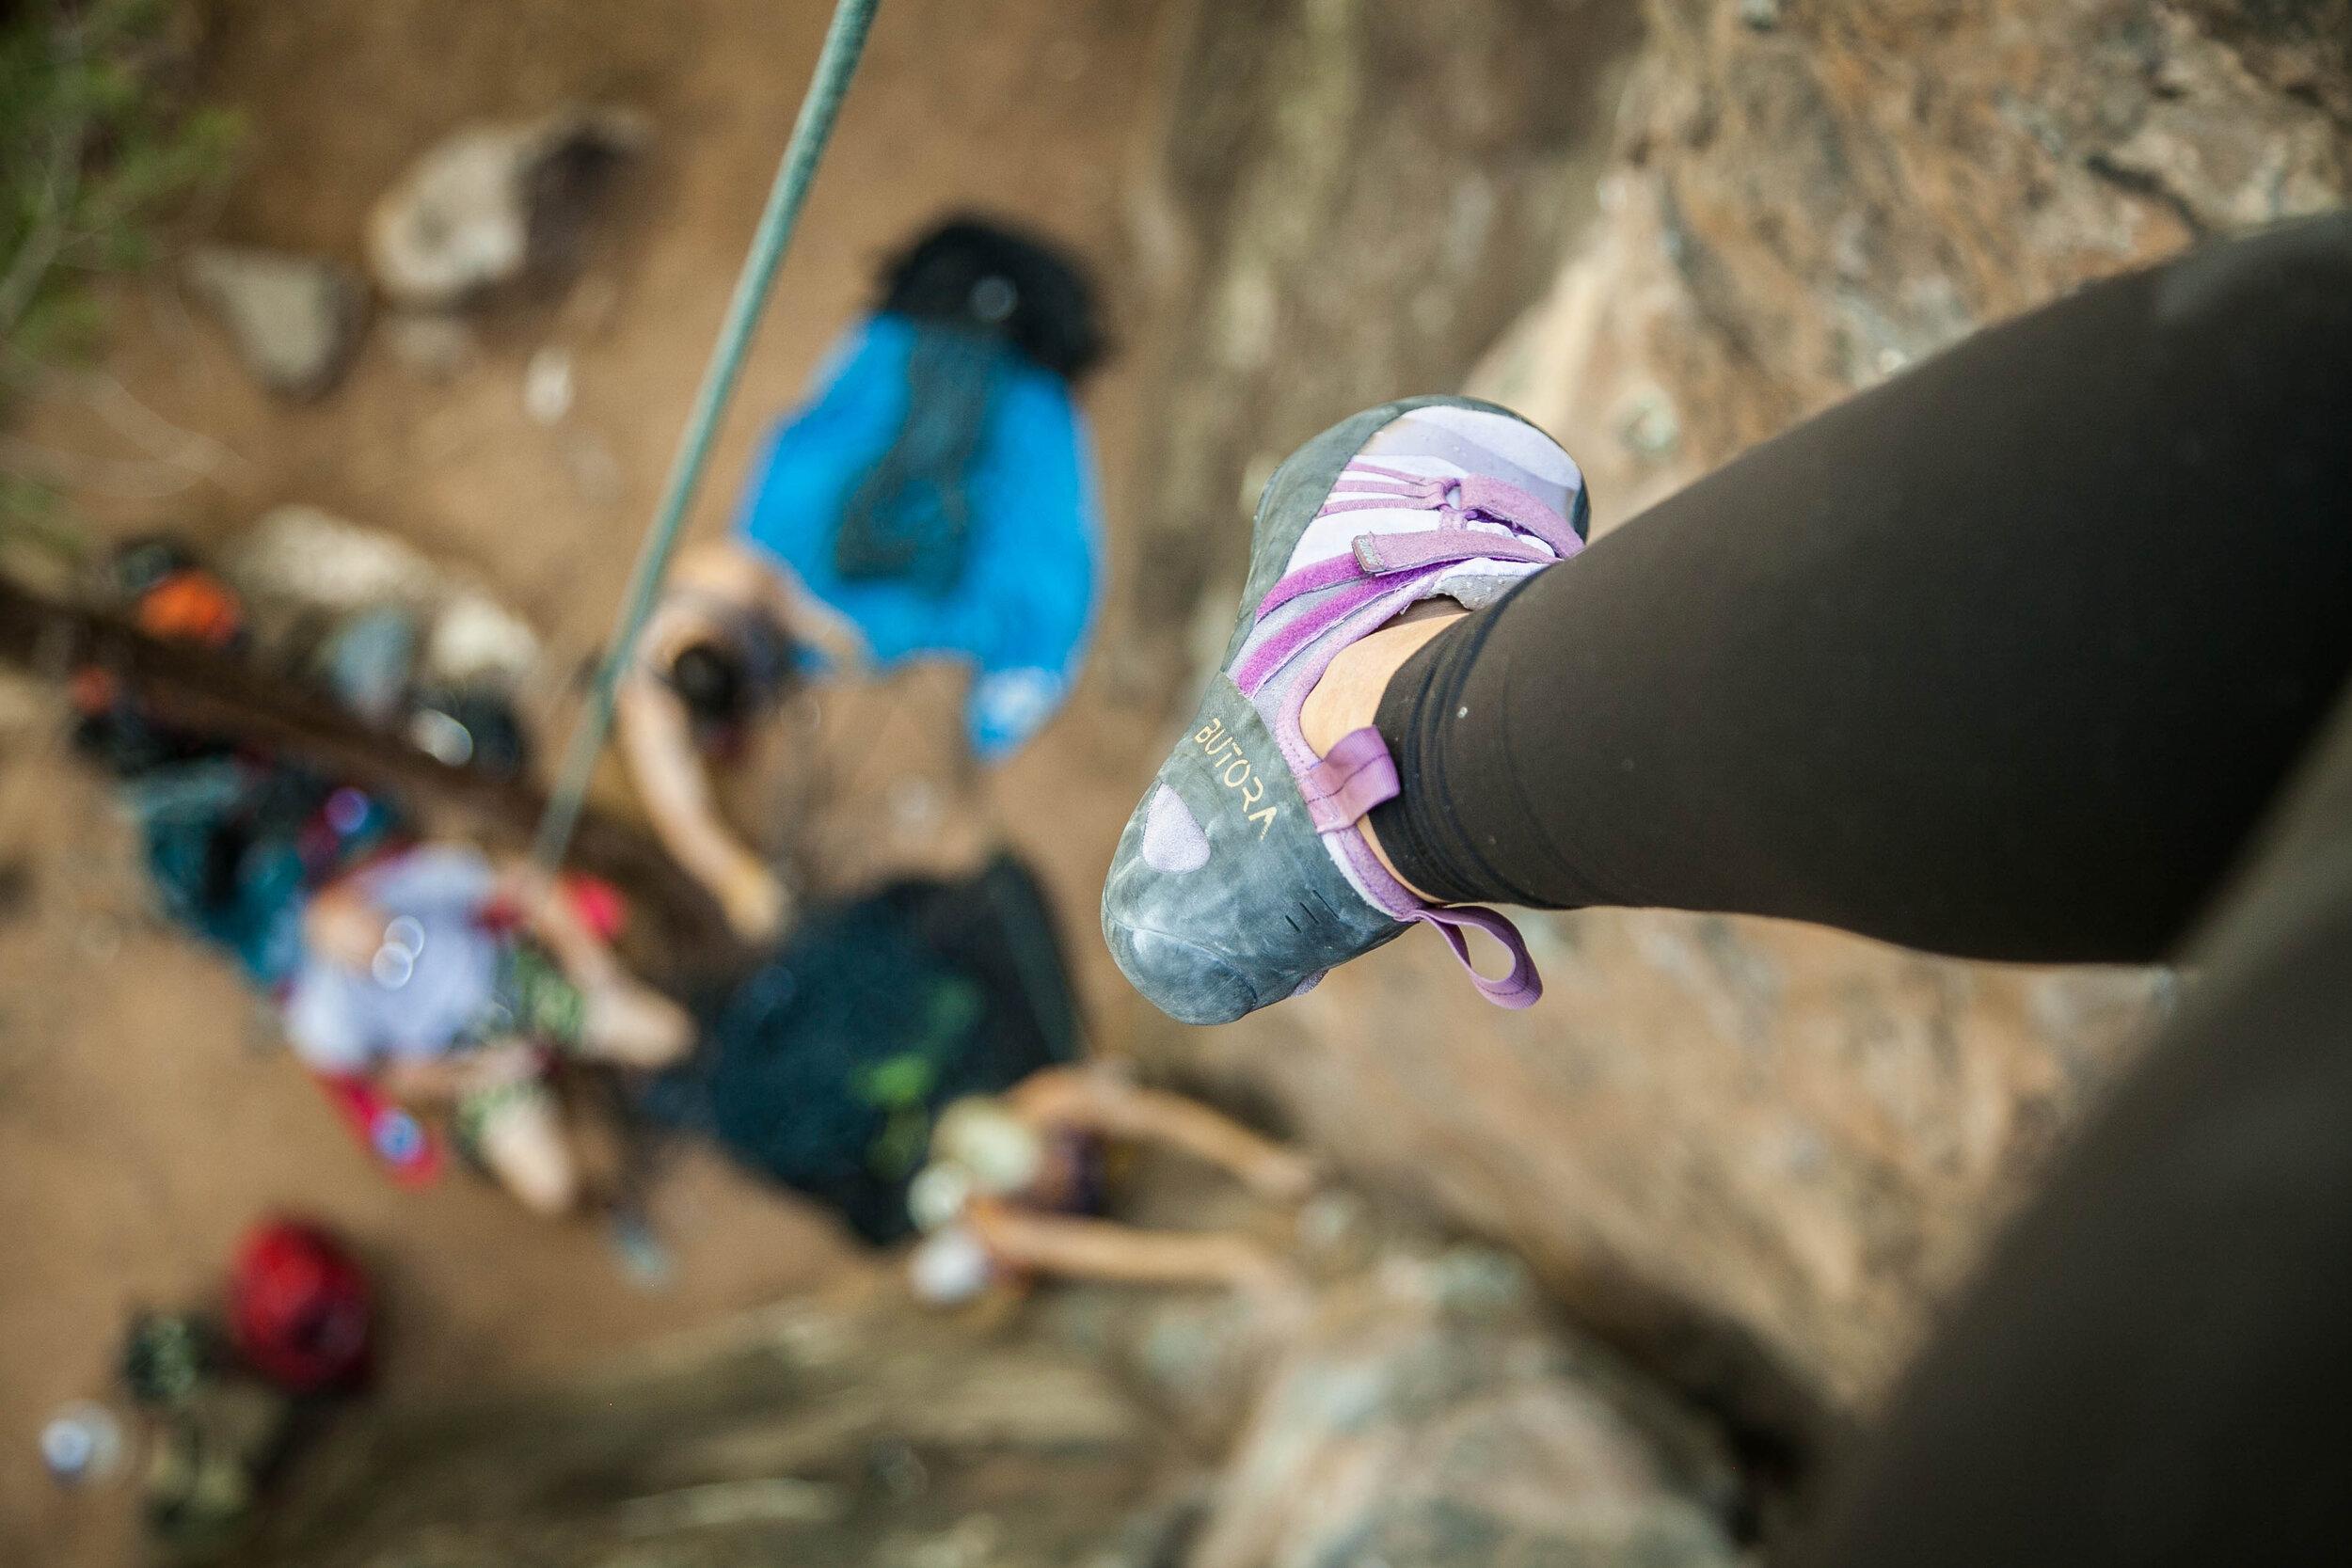 Rock climbing - Location: Boulder Canyon, Lyons, Estes ParkPrice: $30/personGroup Minimum/Maximum: 4/12